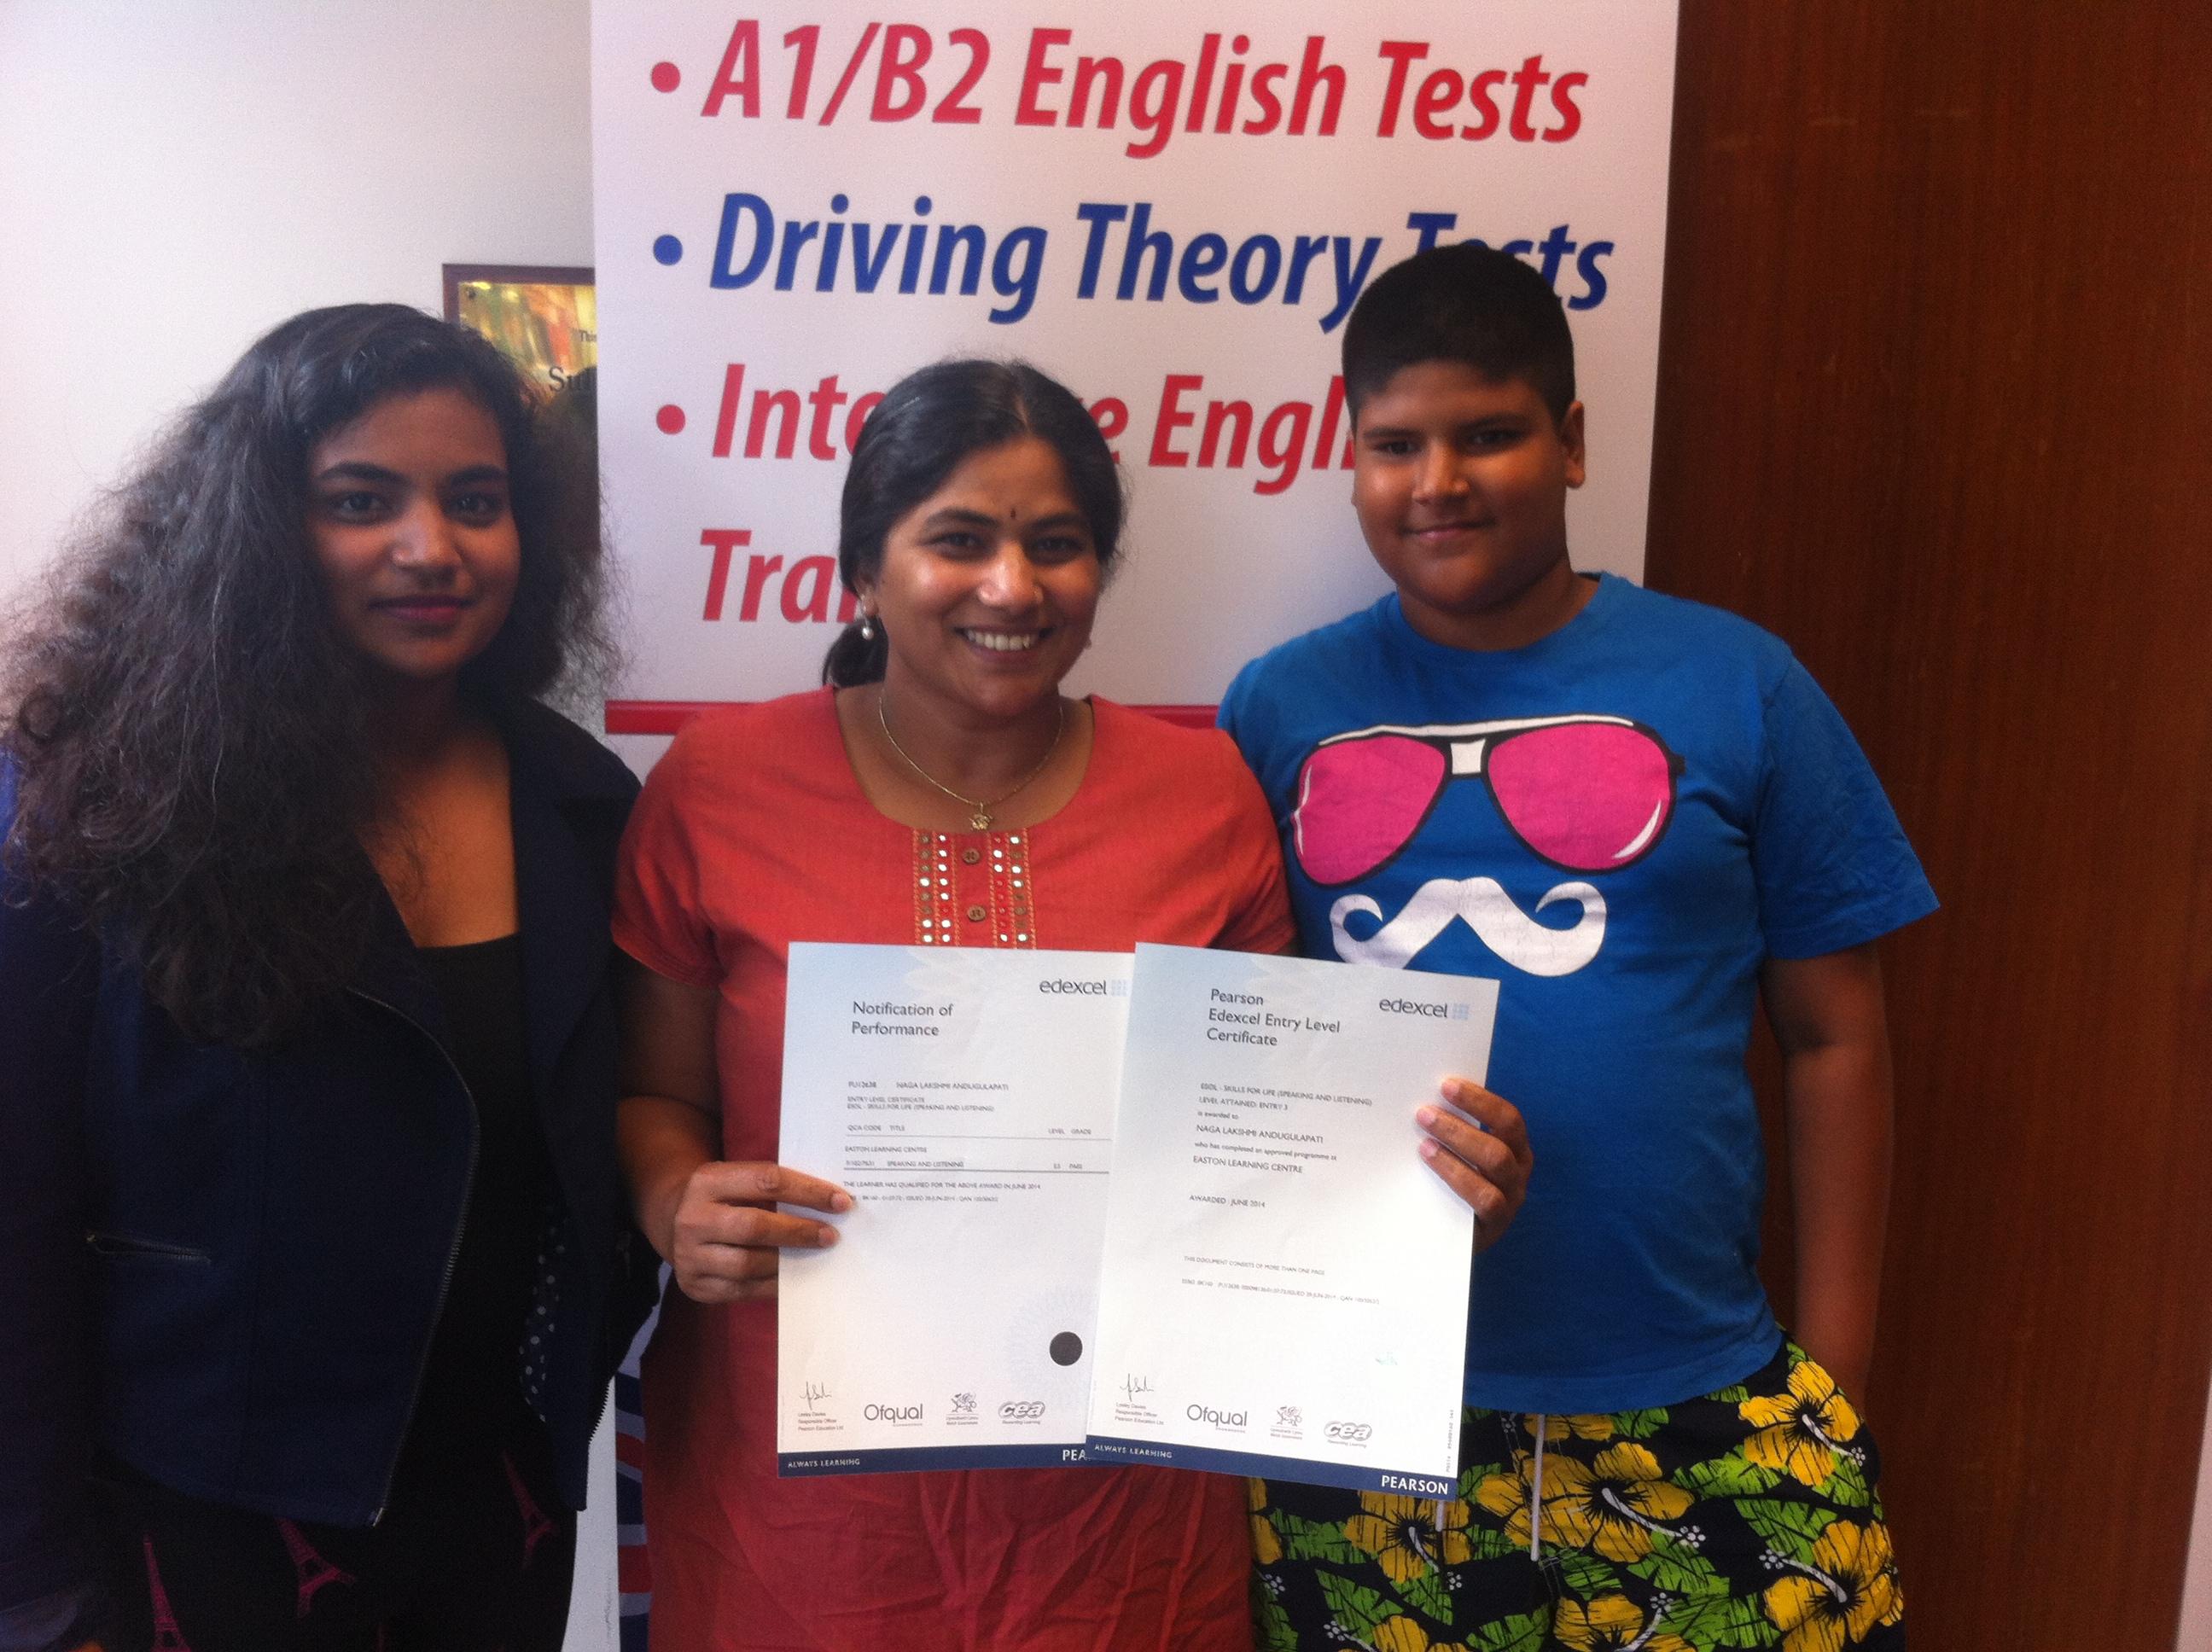 b1 pass certificate